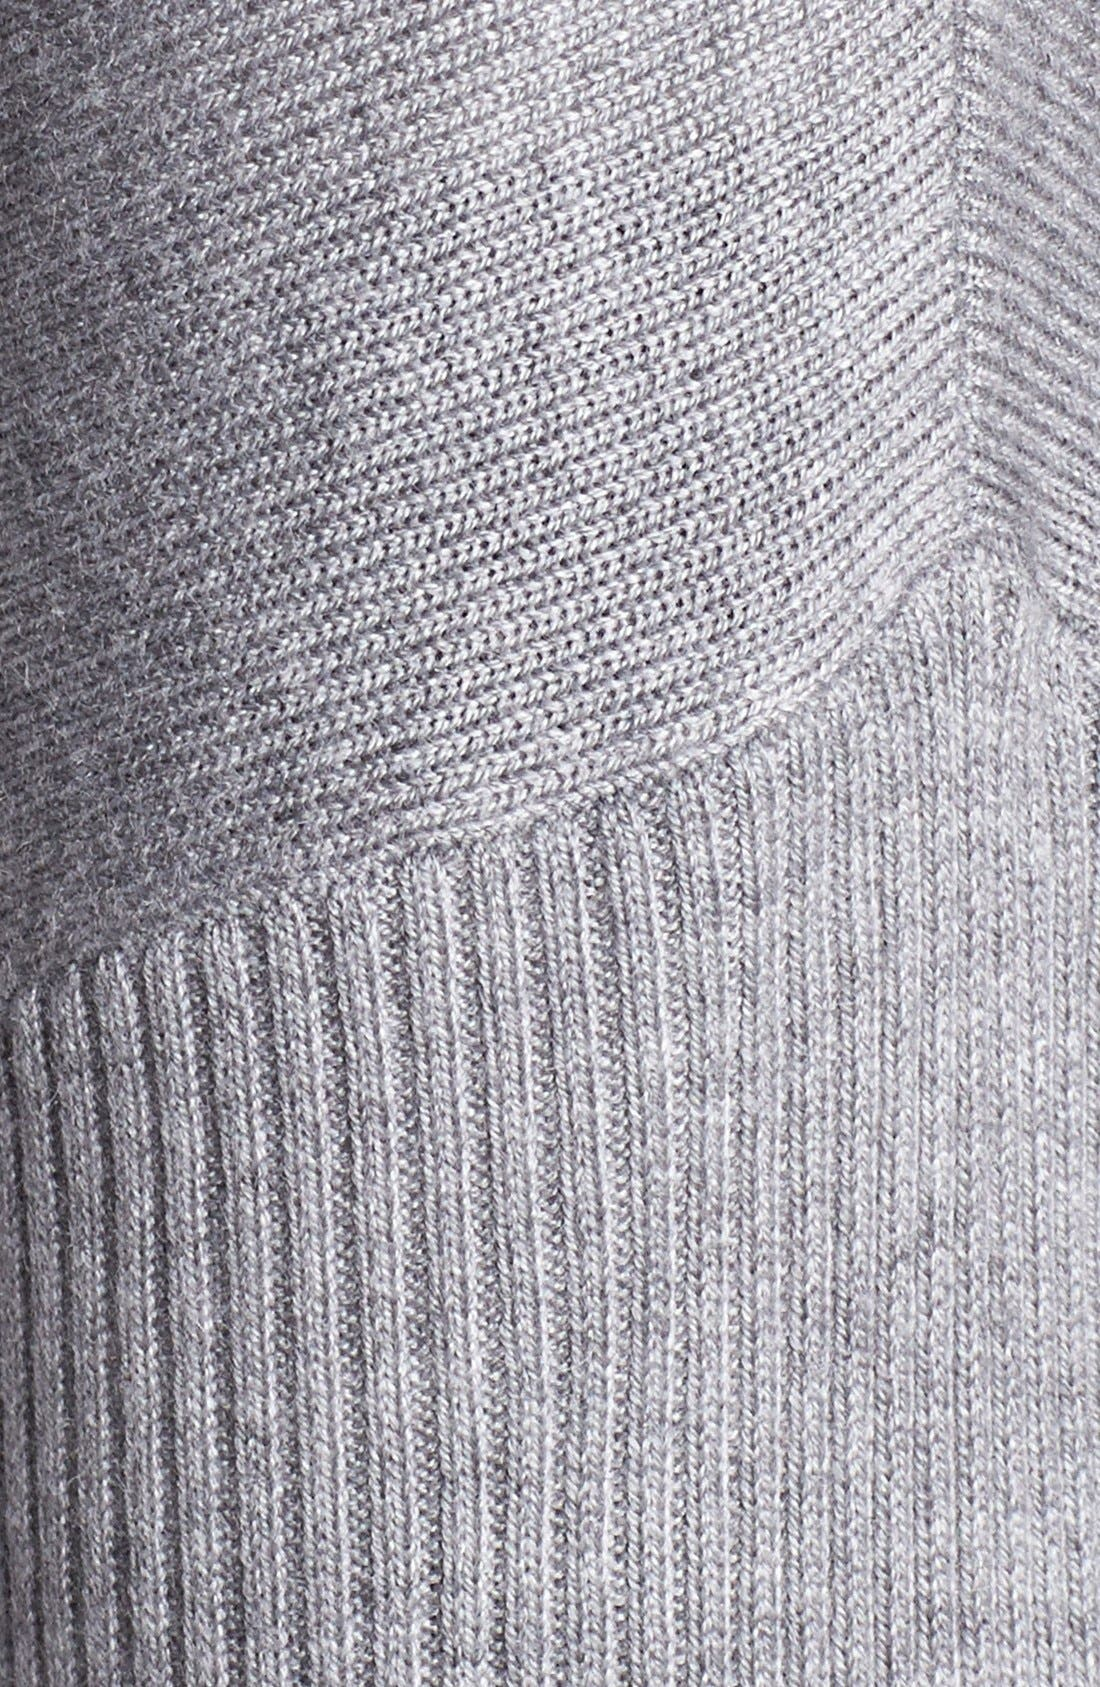 Alternate Image 3  - Vince Camuto Shawl Collar Cardigan (Regular & Petite)